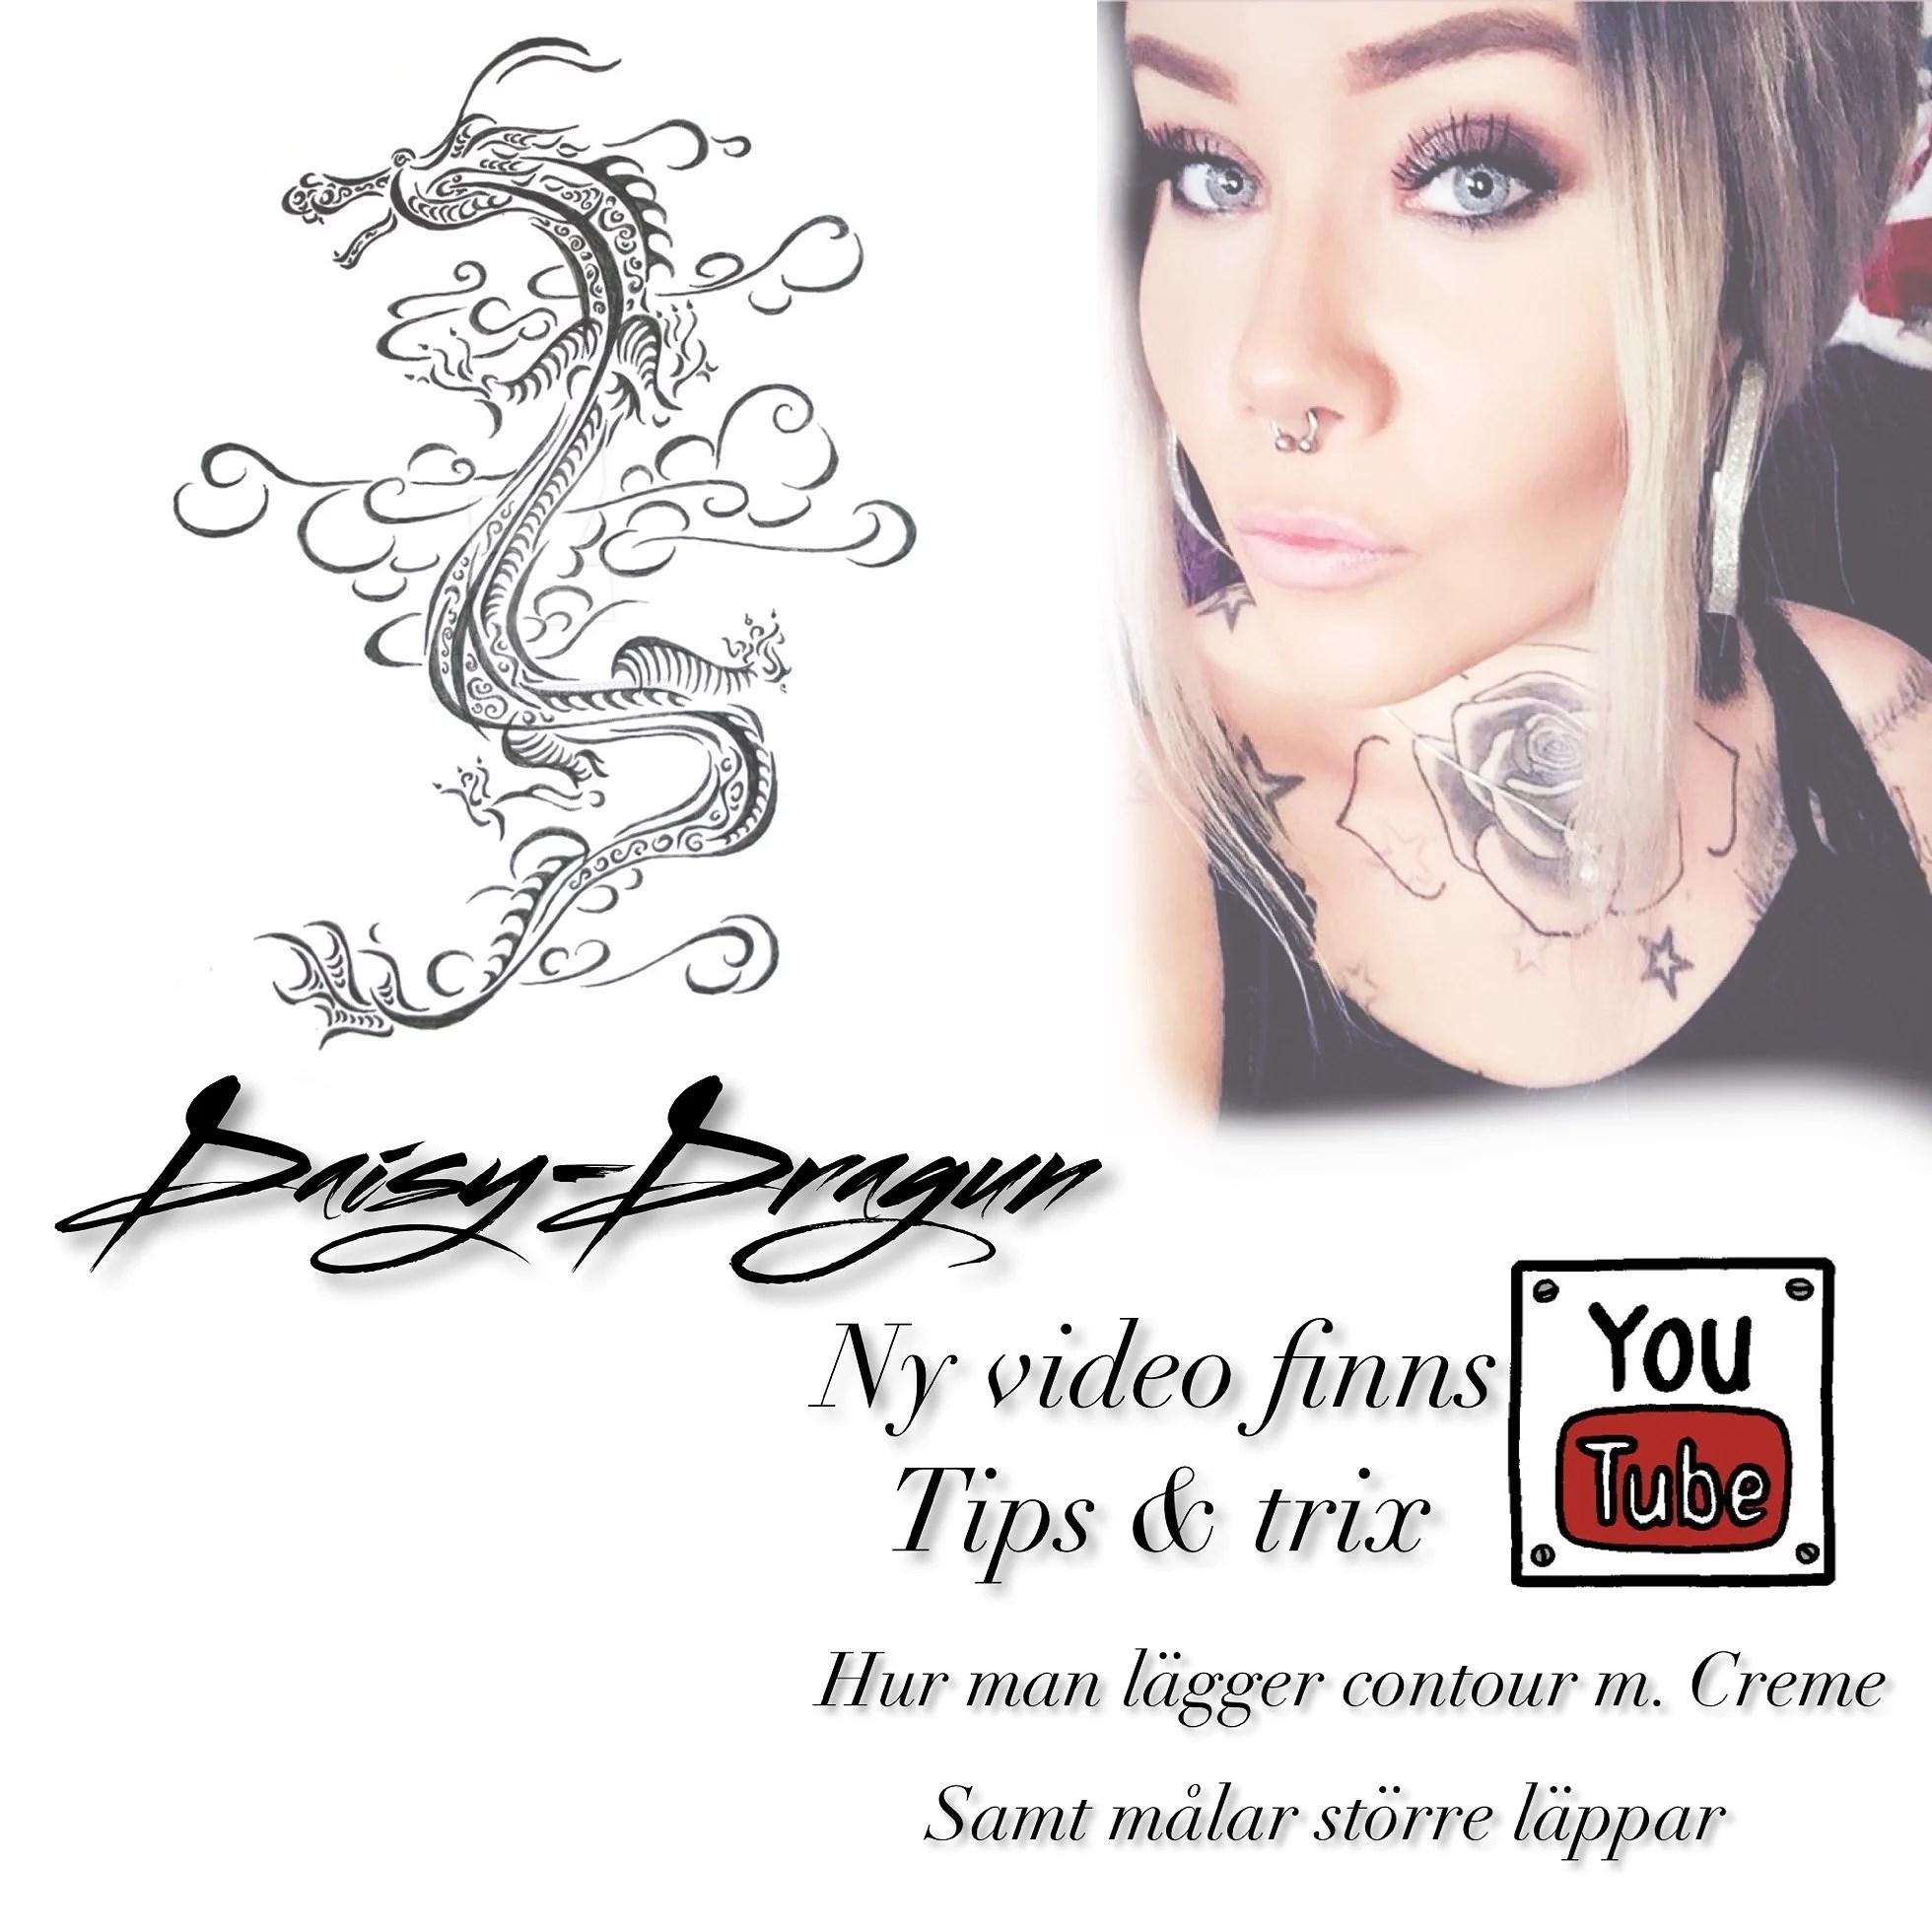 Youtube,makeup tips 💕